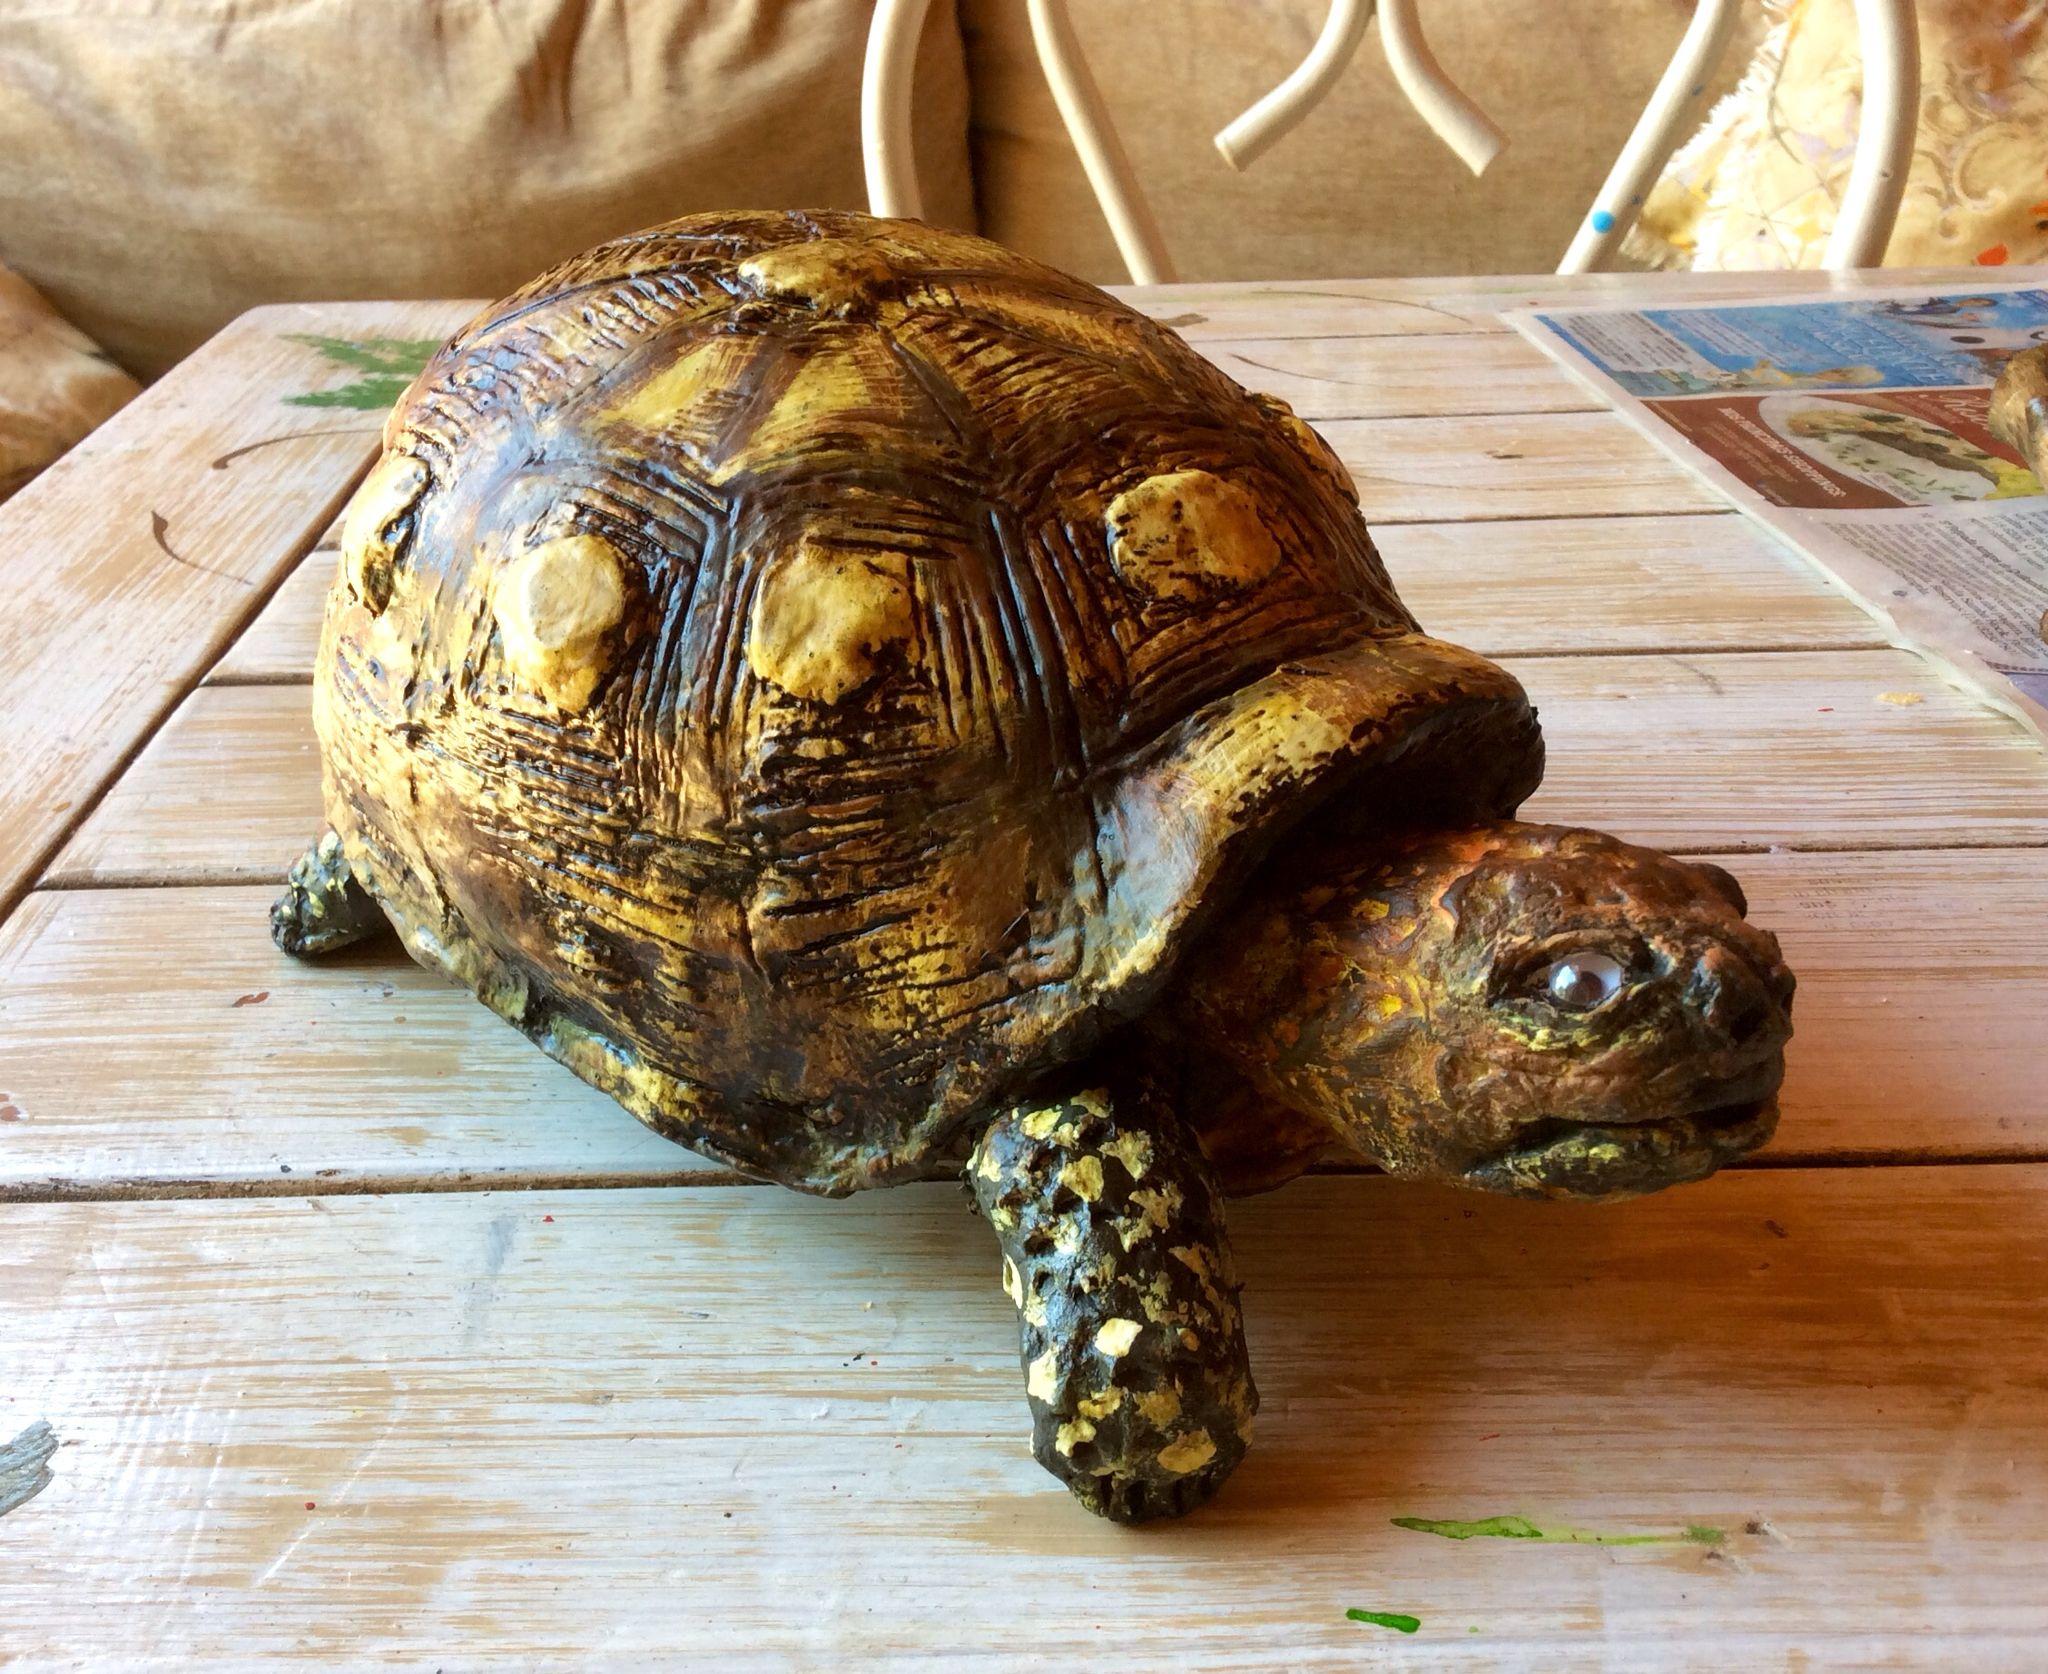 Tartaruga papel machê. Turtle. Papier-mache